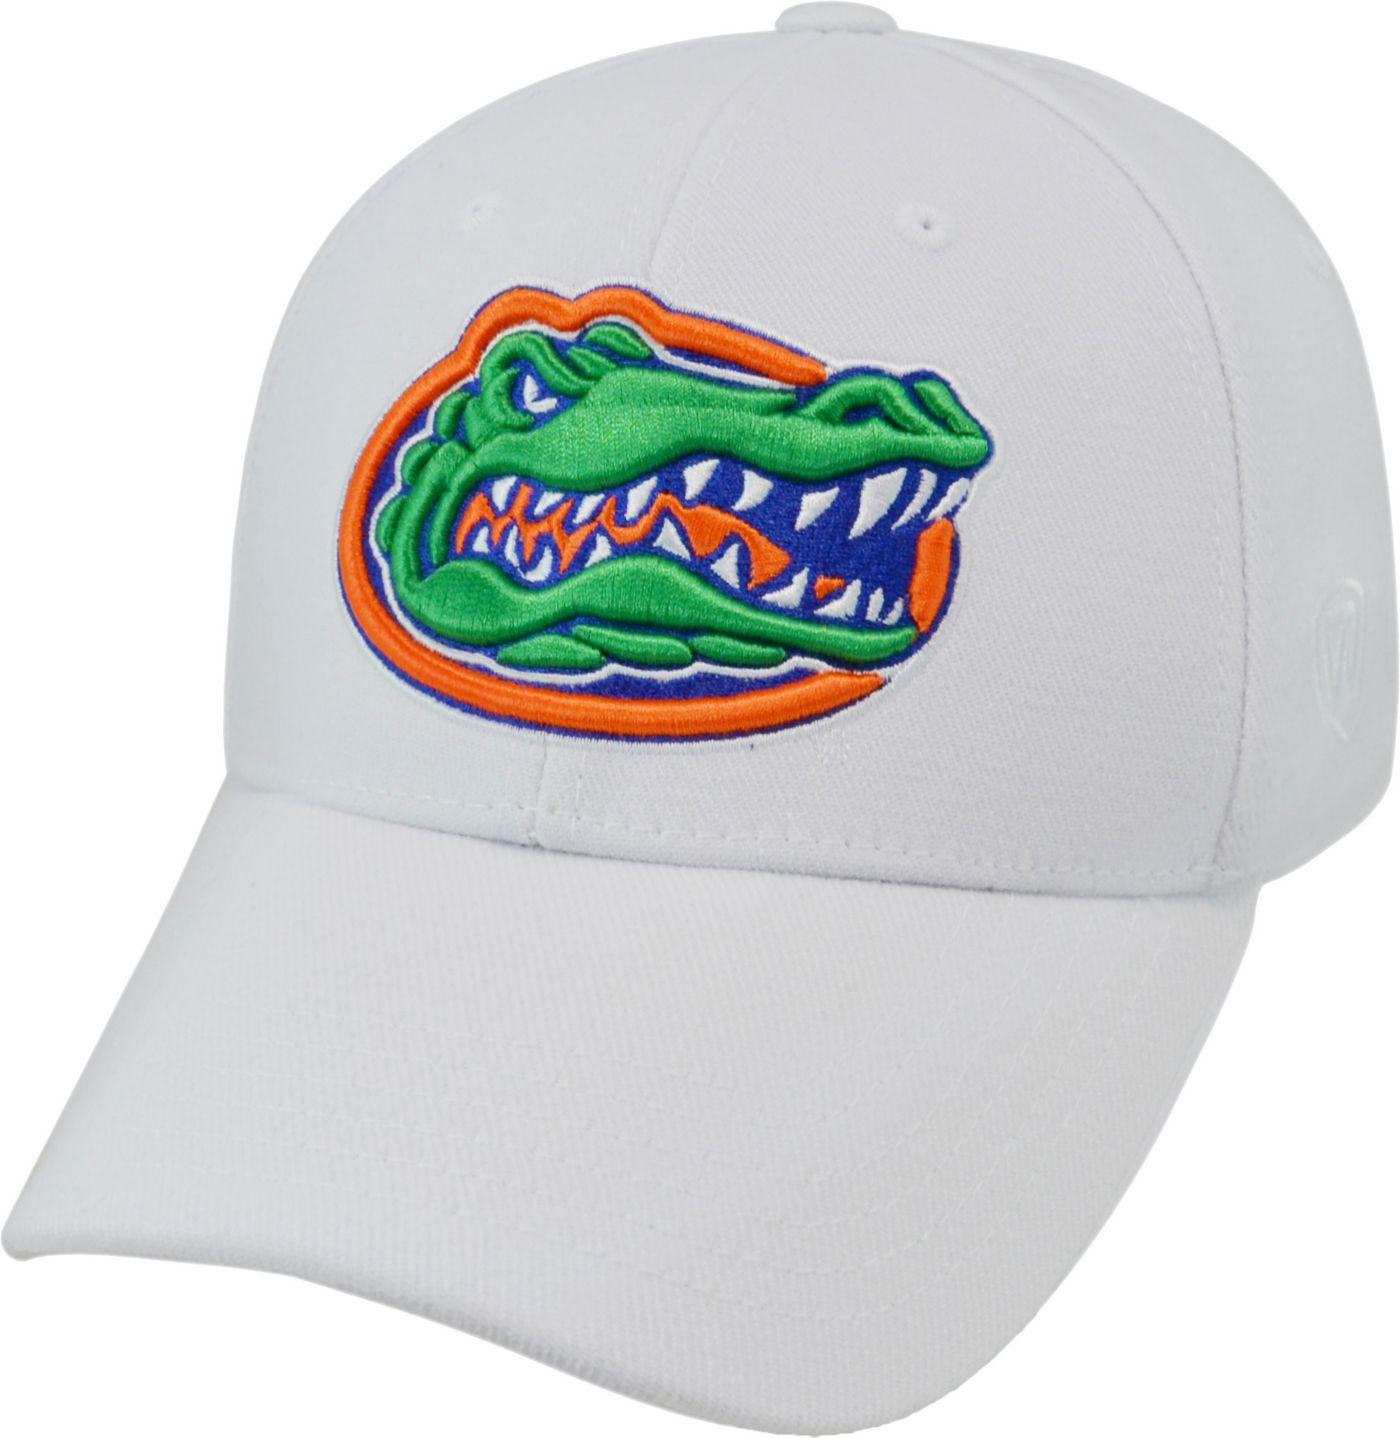 Top of the World Men's Florida Gators White Premium Collection M-Fit Hat